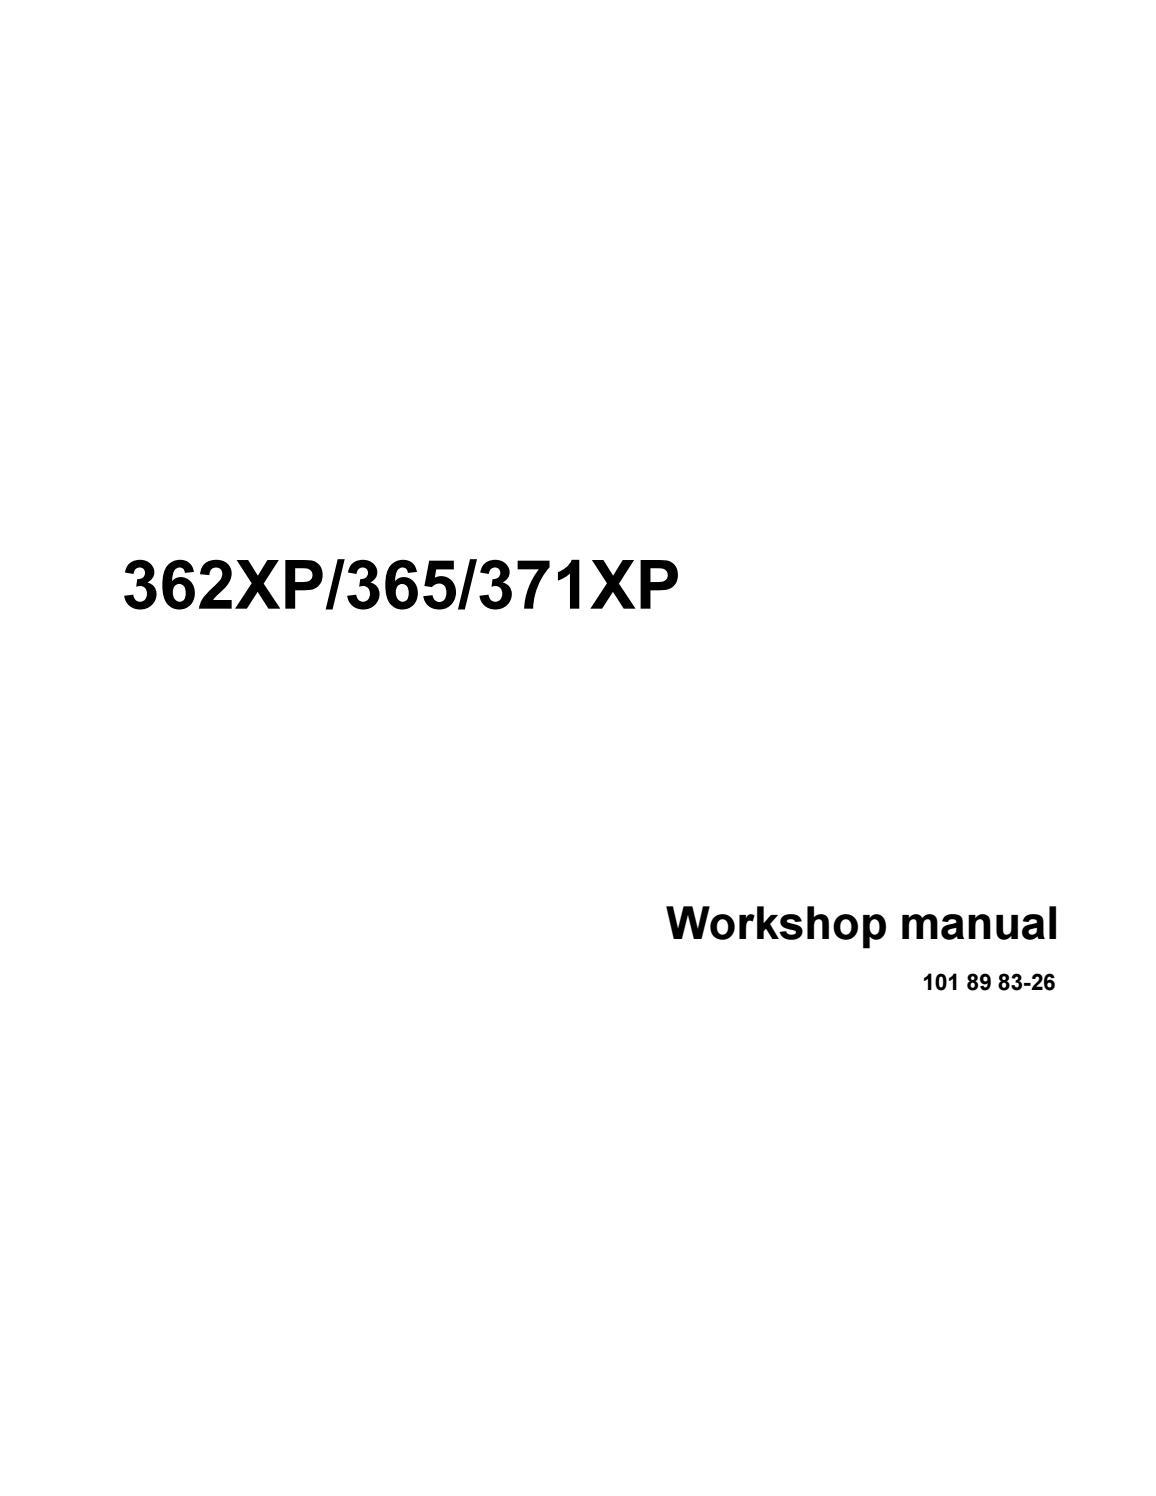 research.unir.net Business, Office & Industrial Equipment Manuals ...